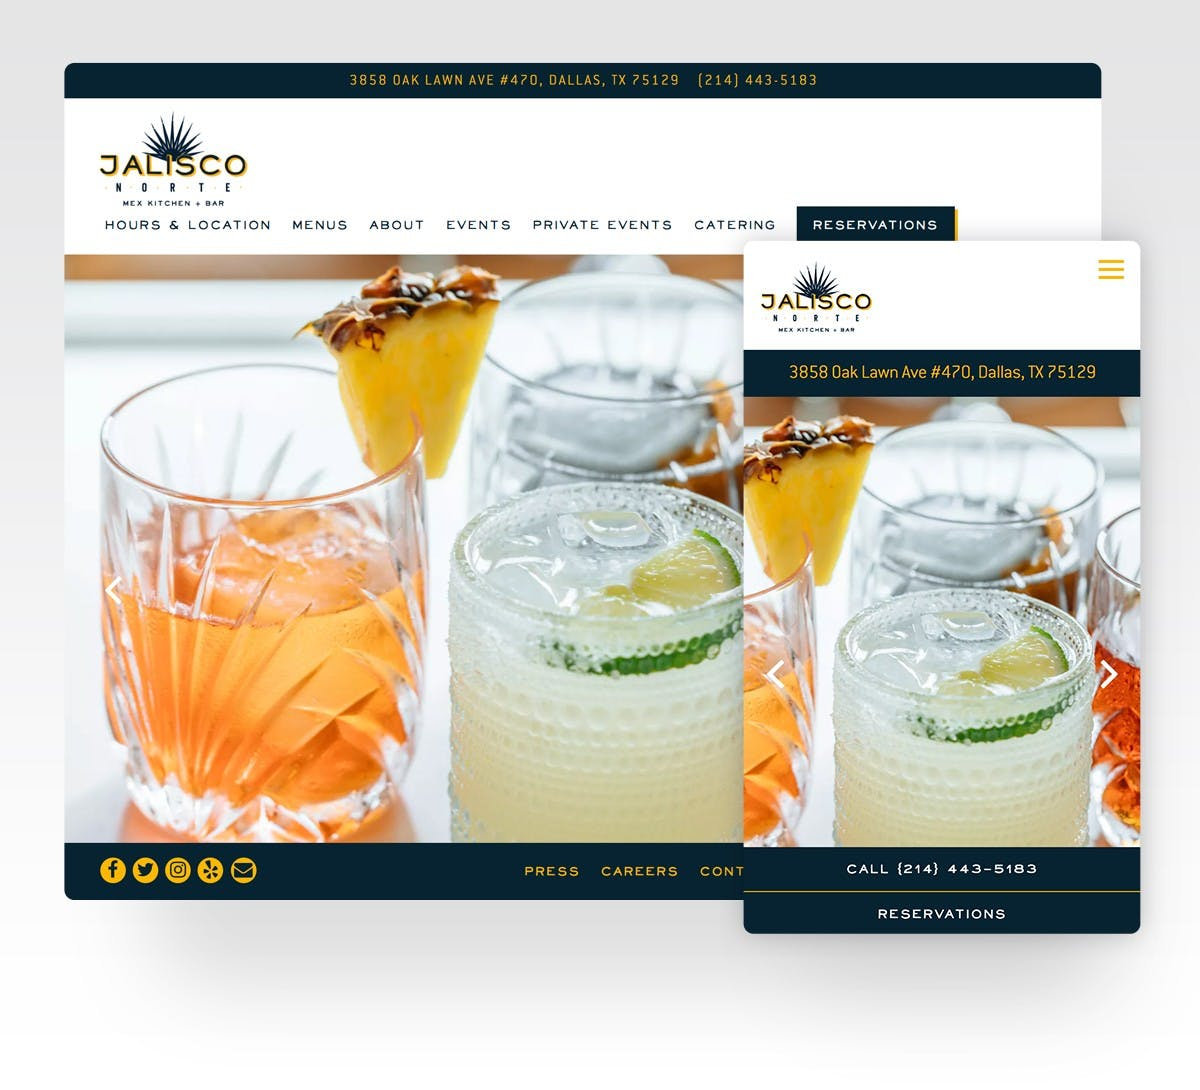 The website for Jalisco Norte